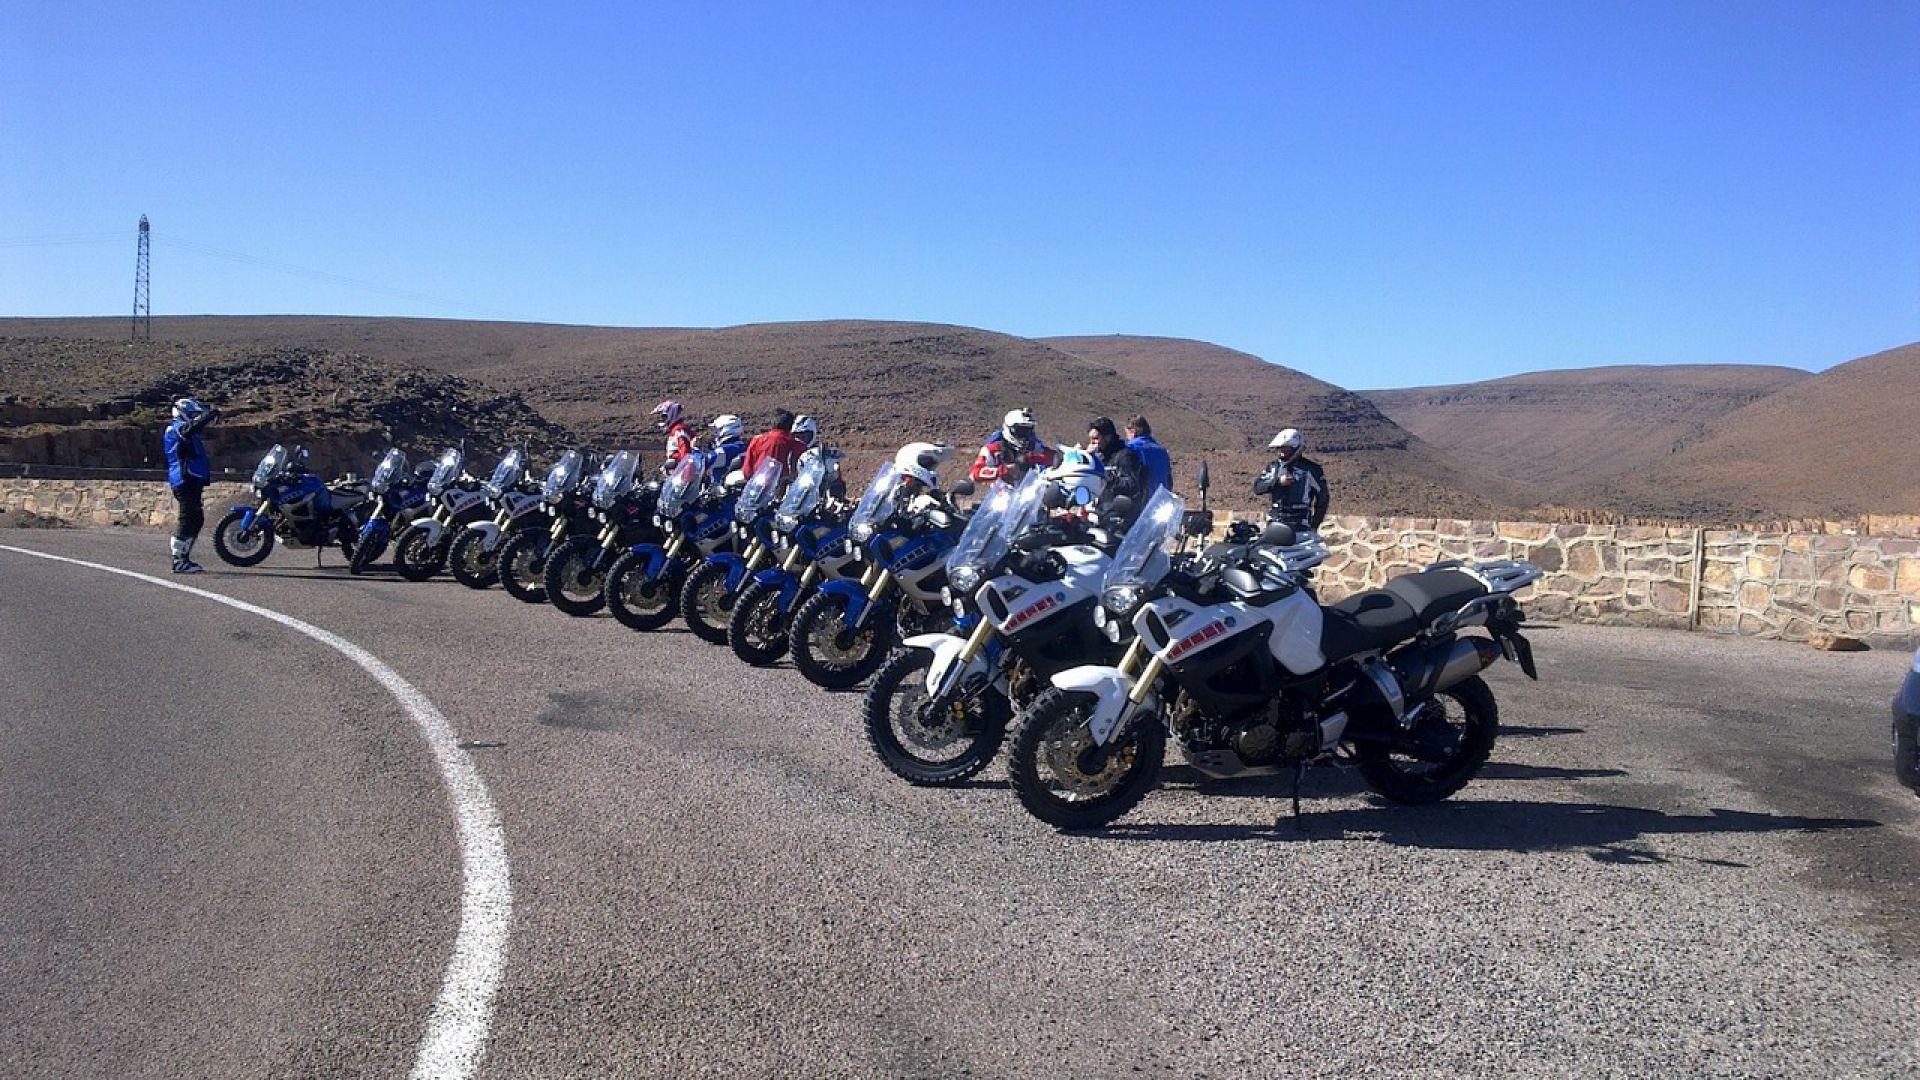 Immagine 167: In Marocco con la Yamaha Super Ténéré